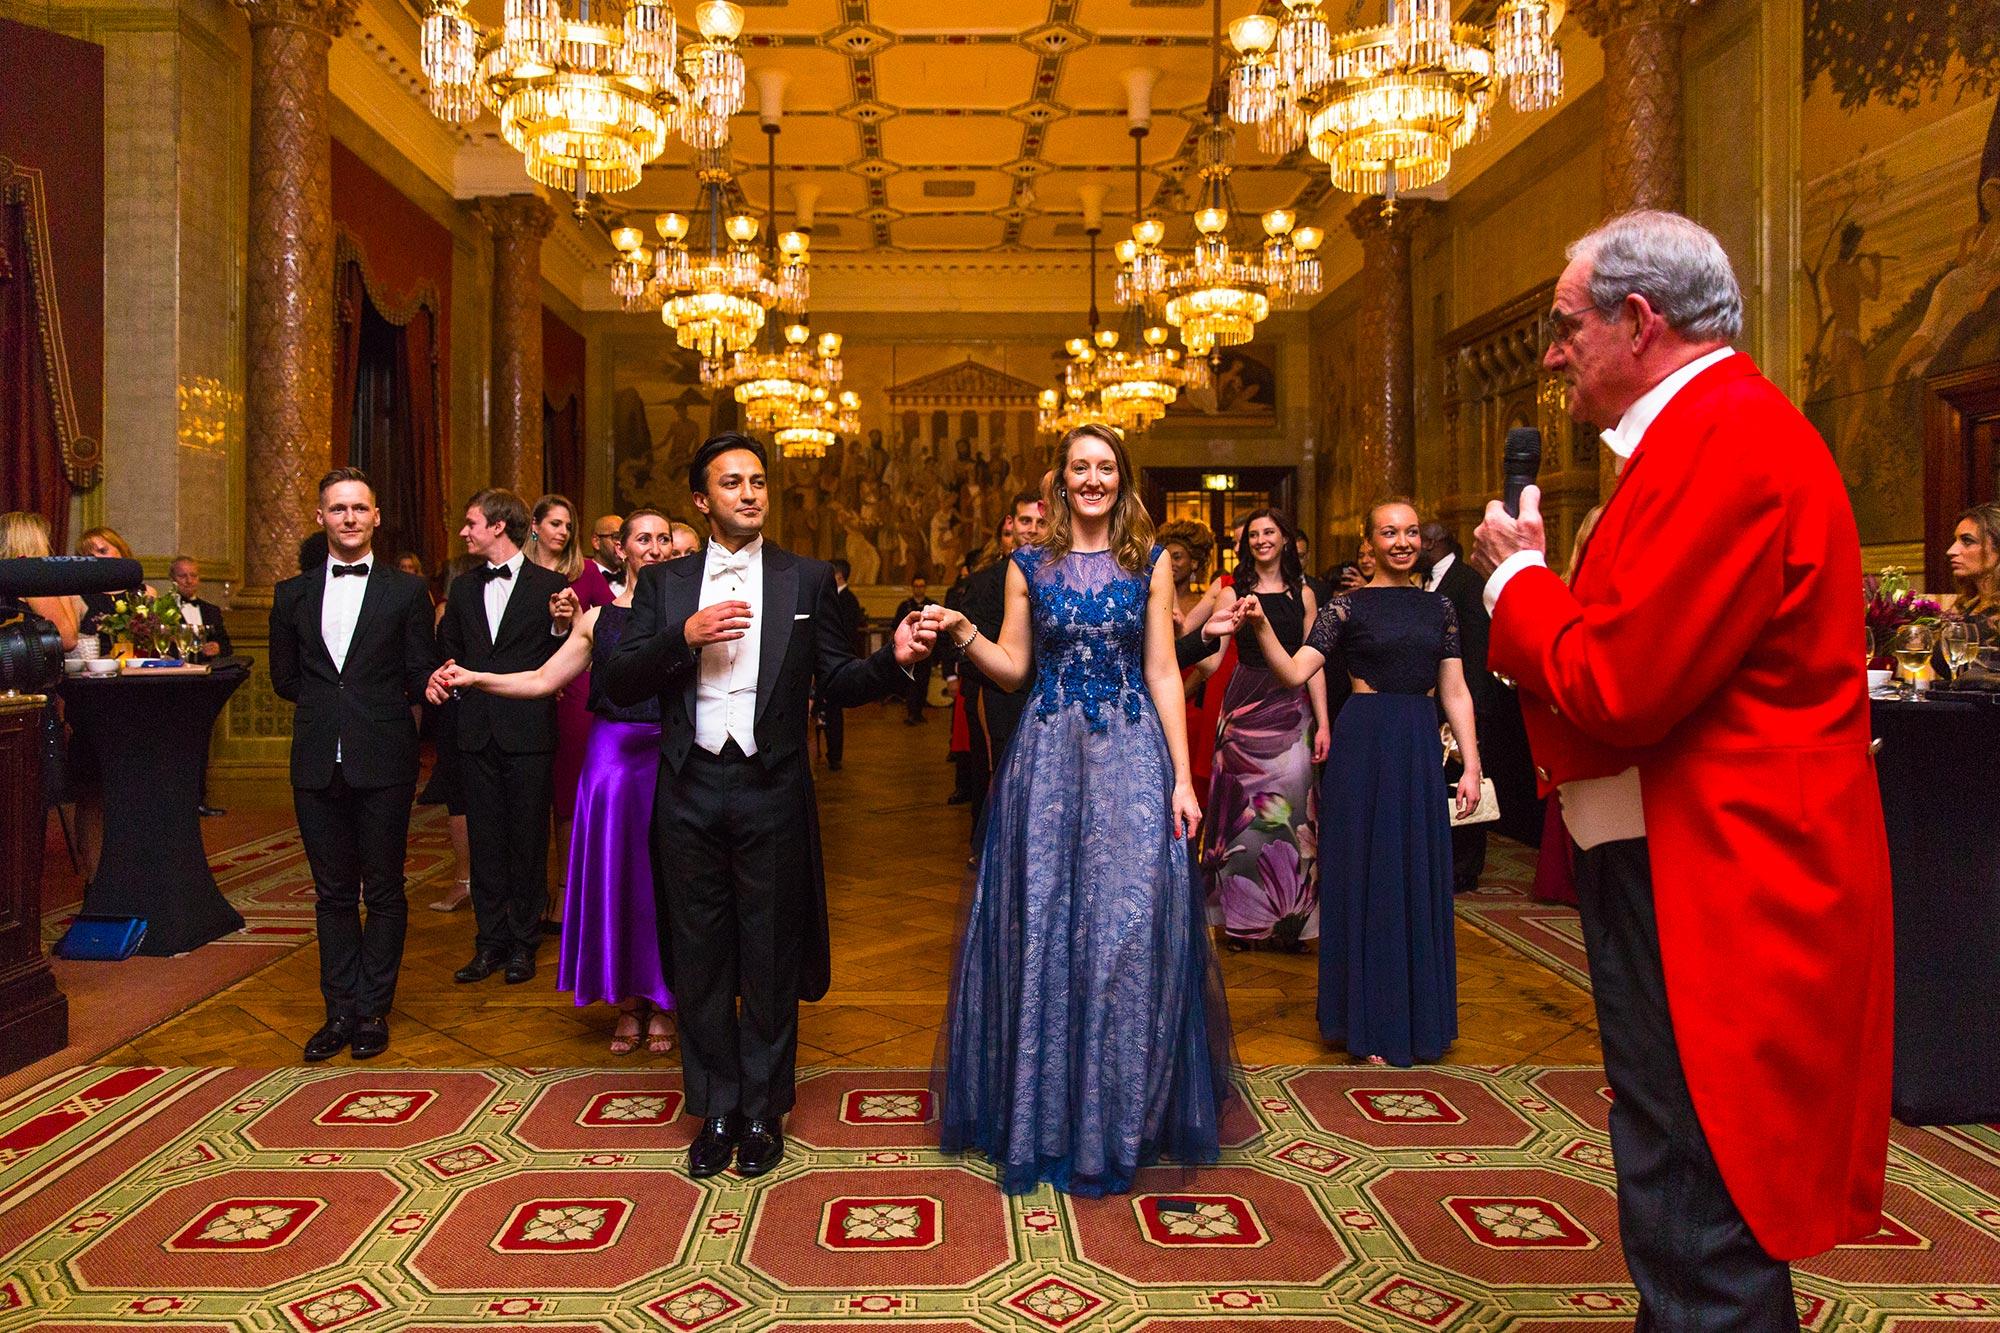 Habib Amir & Jessamie Dunton-Rose leading the Vienna Pose, Prestigious Star Awards Grand Ball 2019, Prestigious Venues